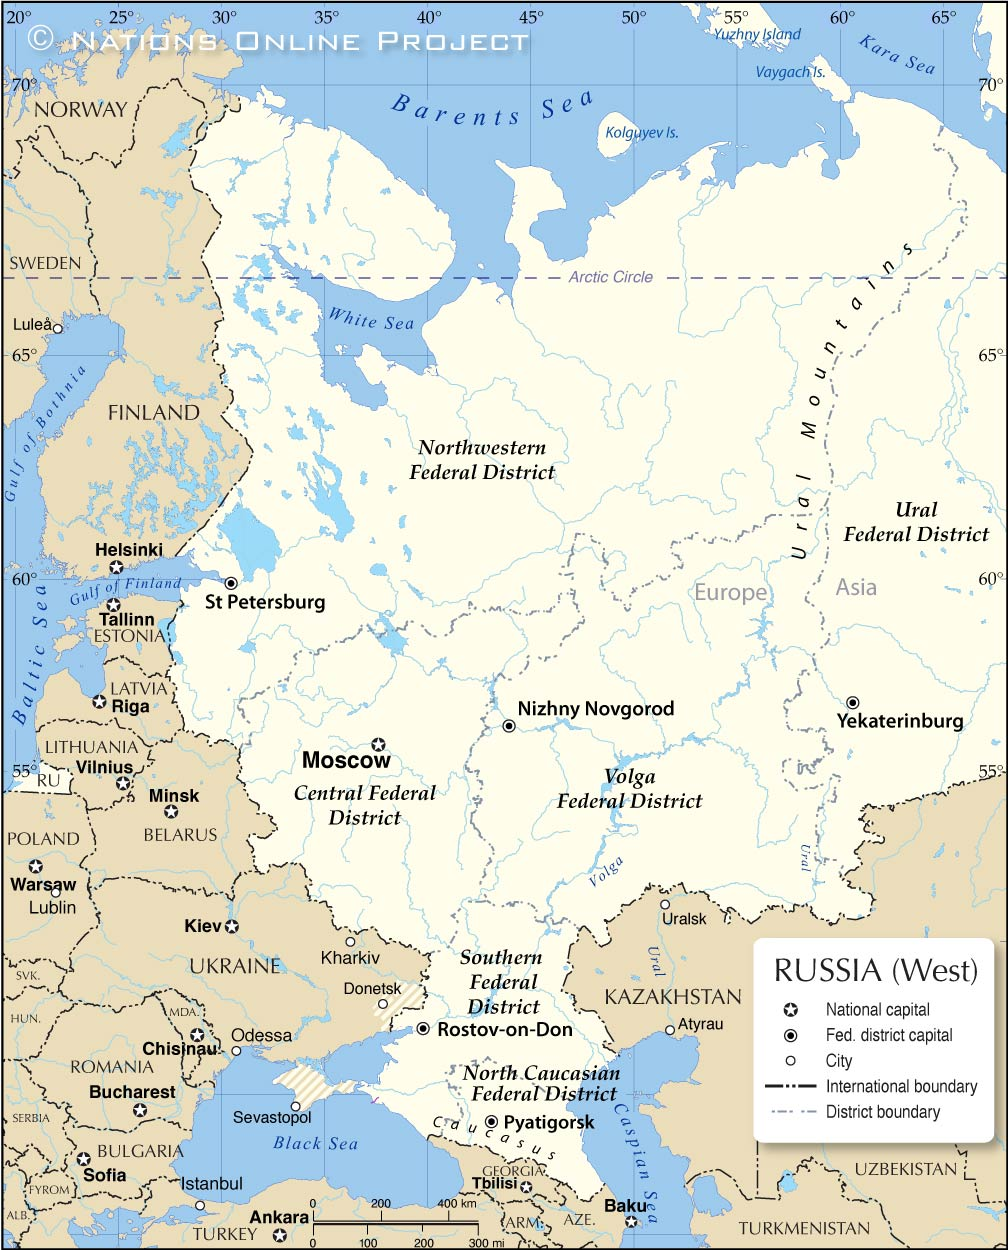 Russia And Eurasian Republics Map : russia, eurasian, republics, European, Russia, Nations, Online, Project